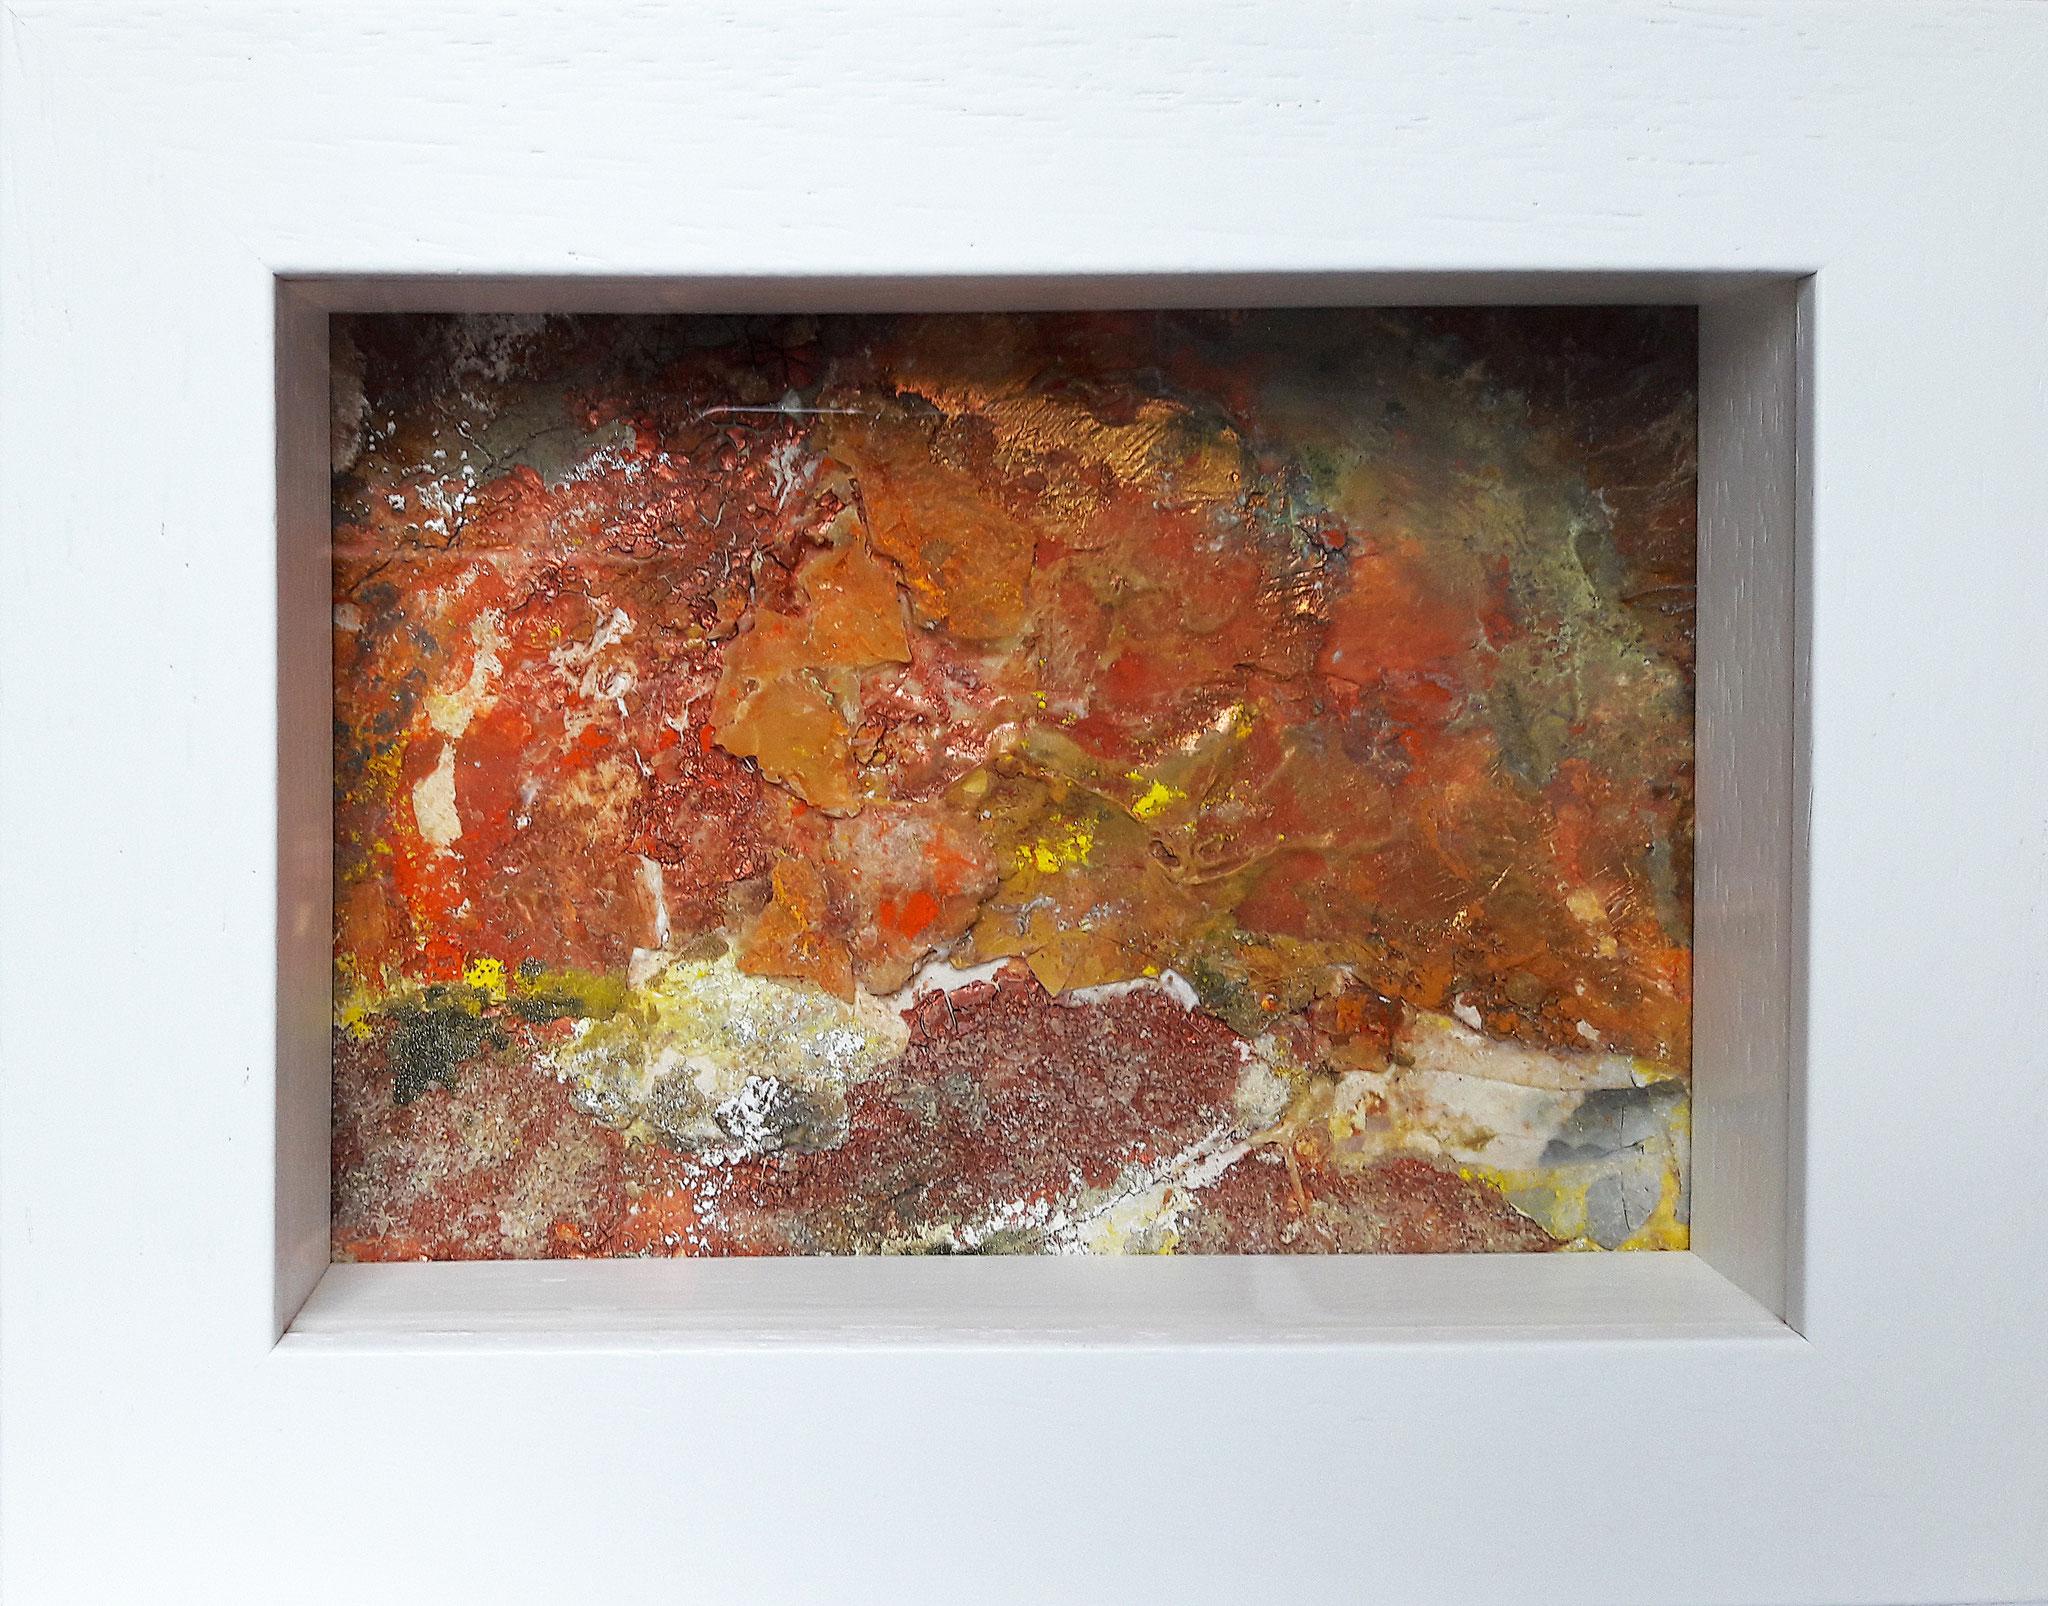 Papperlapapp 7, Acrylmischtechnik, 23 x 18 mit Rahmen, 2017, 140 Euro